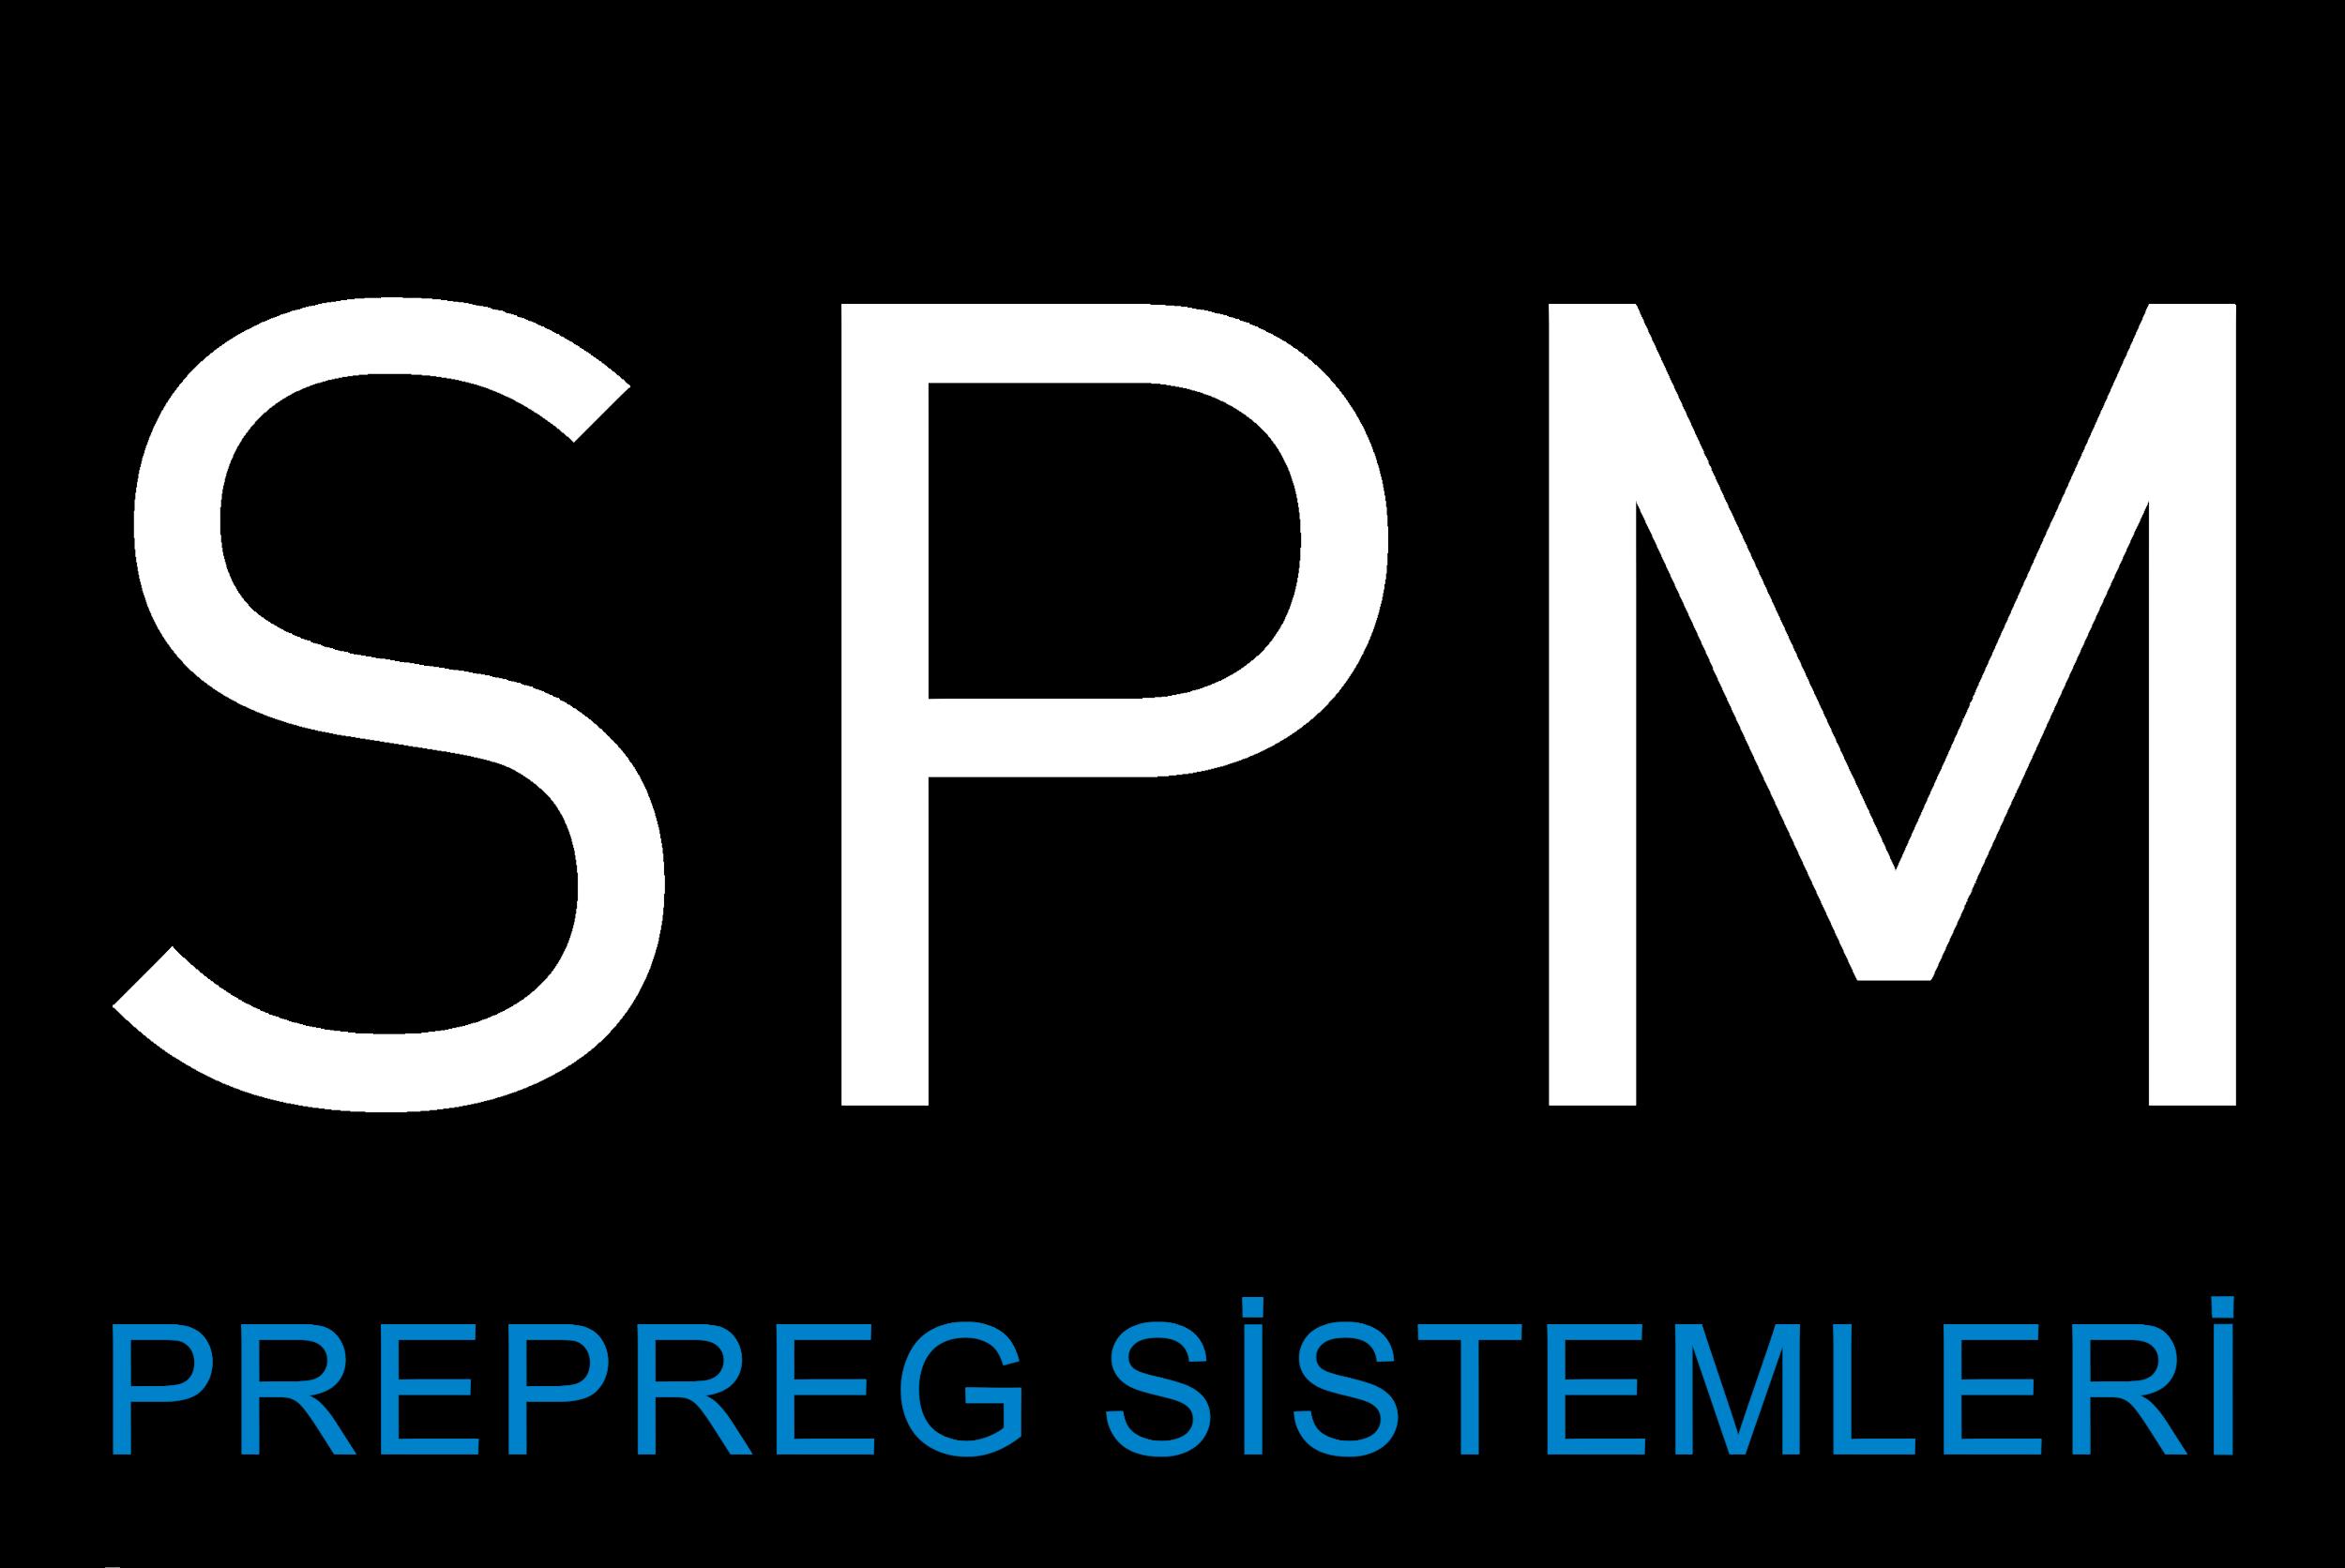 SPM LOGO ppg tr.png